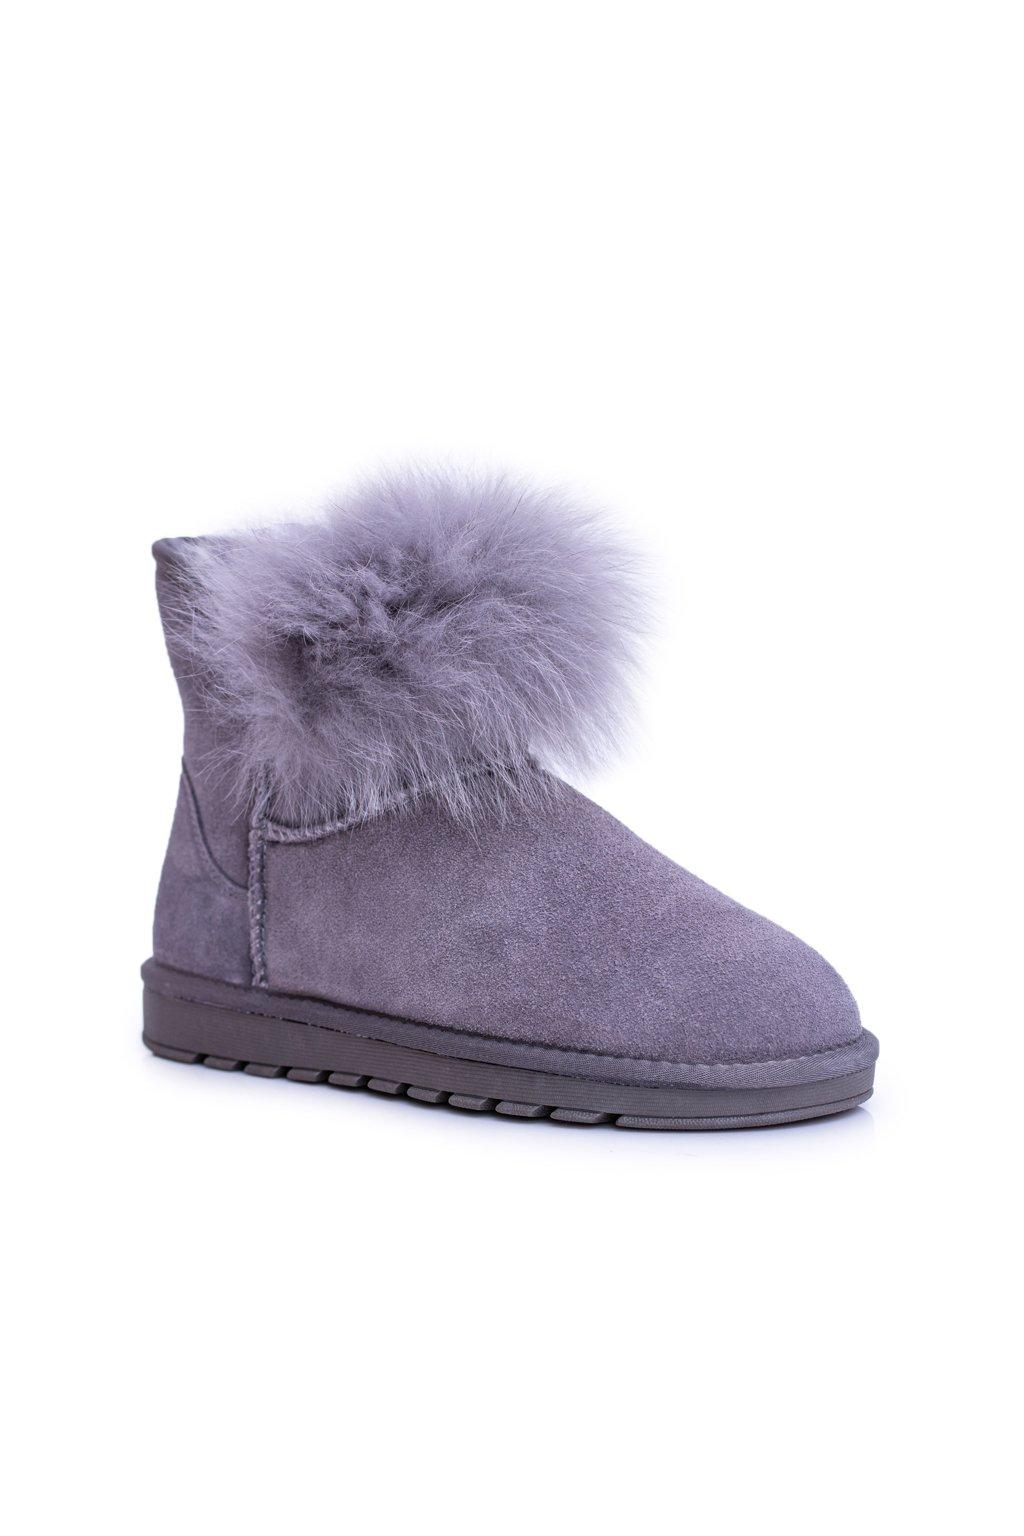 Dámske snehule farba sivá kód obuvi W8011 GREY